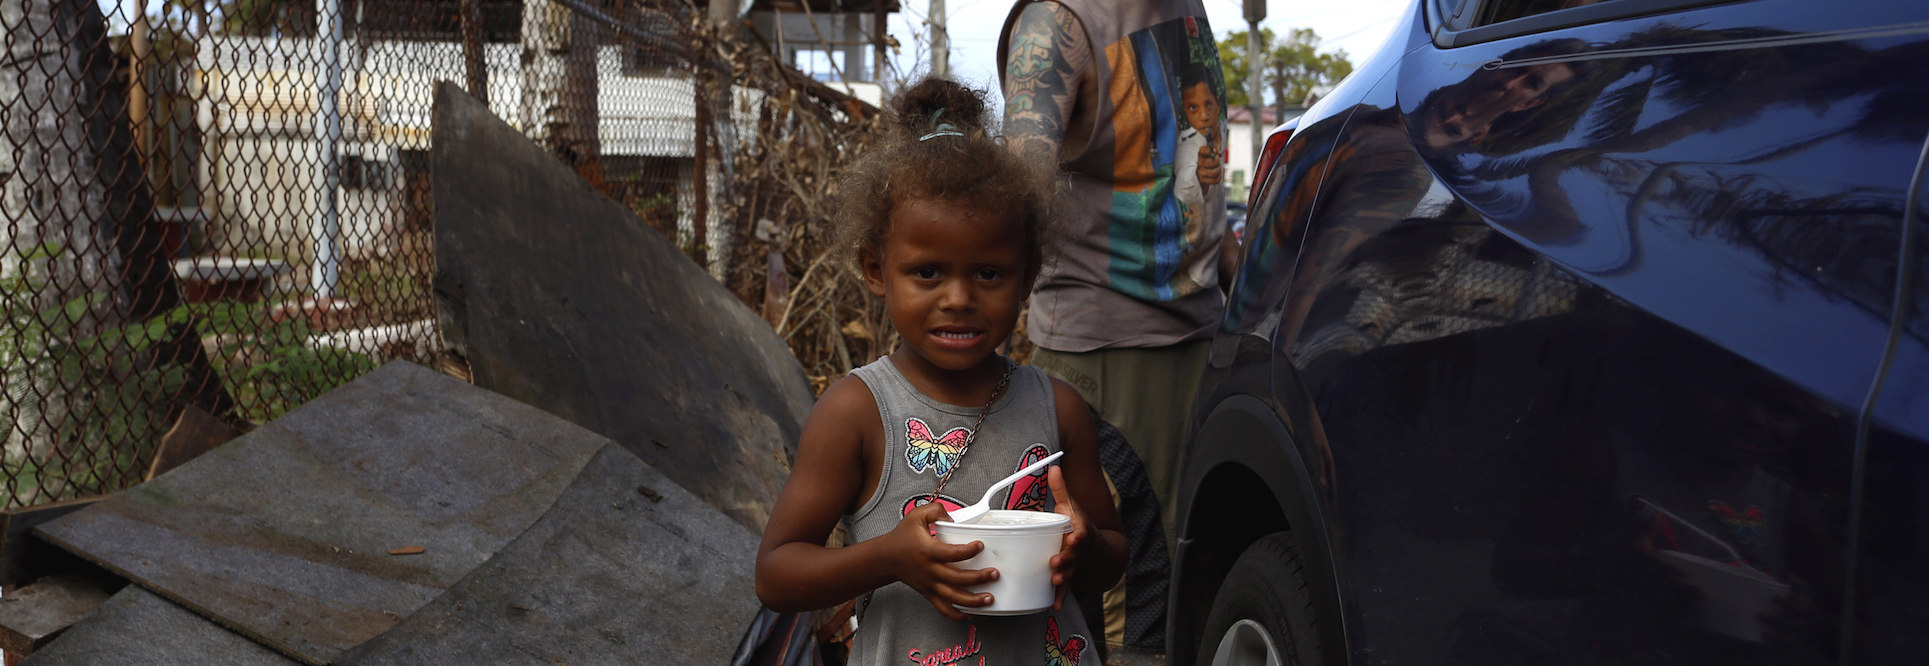 "Juan Carlos Jimenez, volunteer of the ""Plato Caliente"" project, observes the girl Isaura García after bringing her plate of food on October 6, 2017, in Barrio Obrero of Santurce district in San Juan, Puerto Rico."